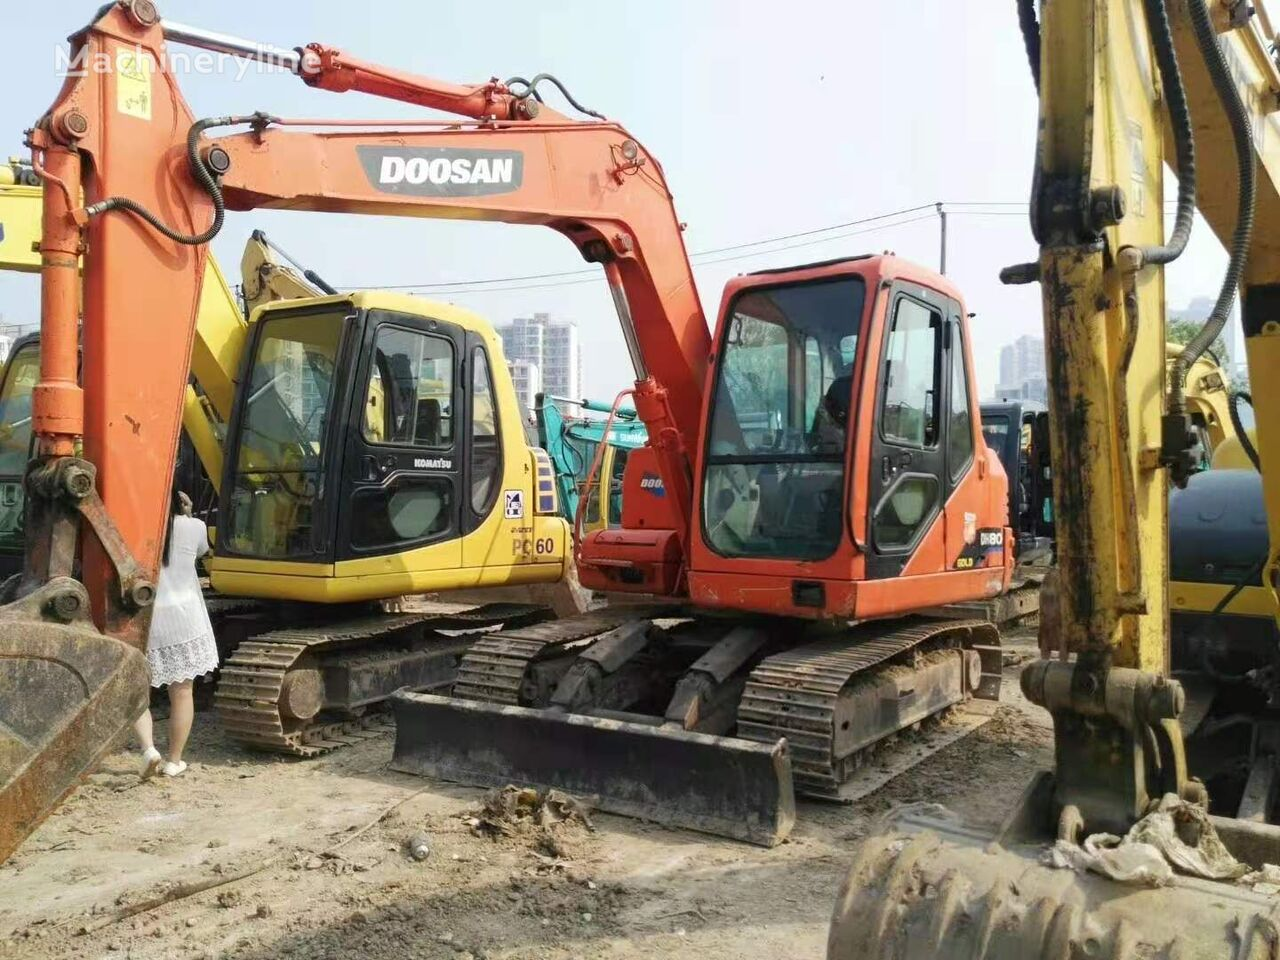 DOOSAN DH80 mini excavator